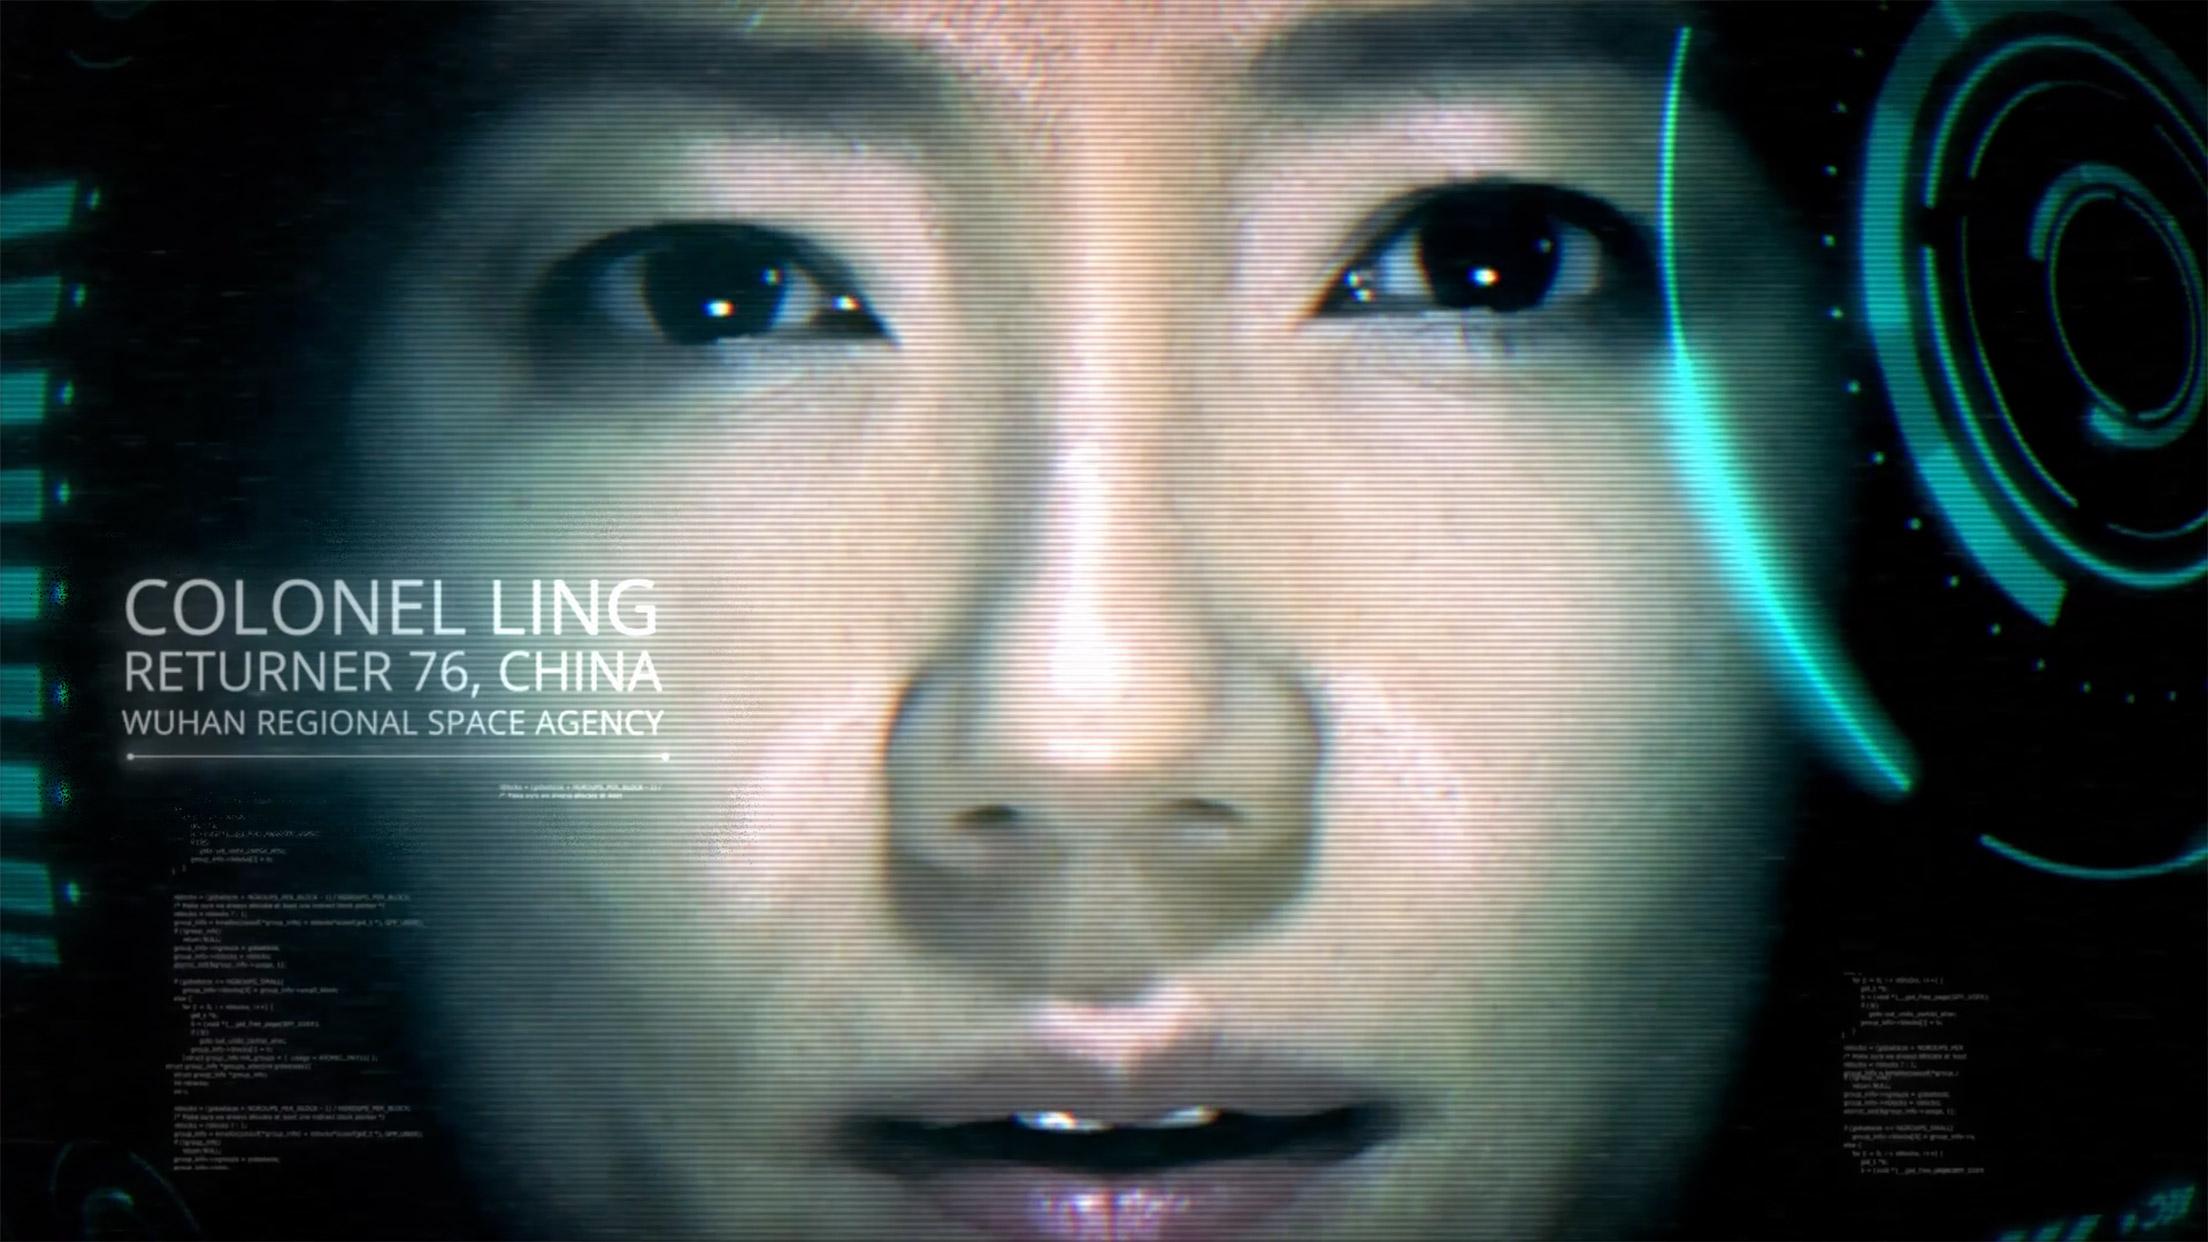 ling-no-logo